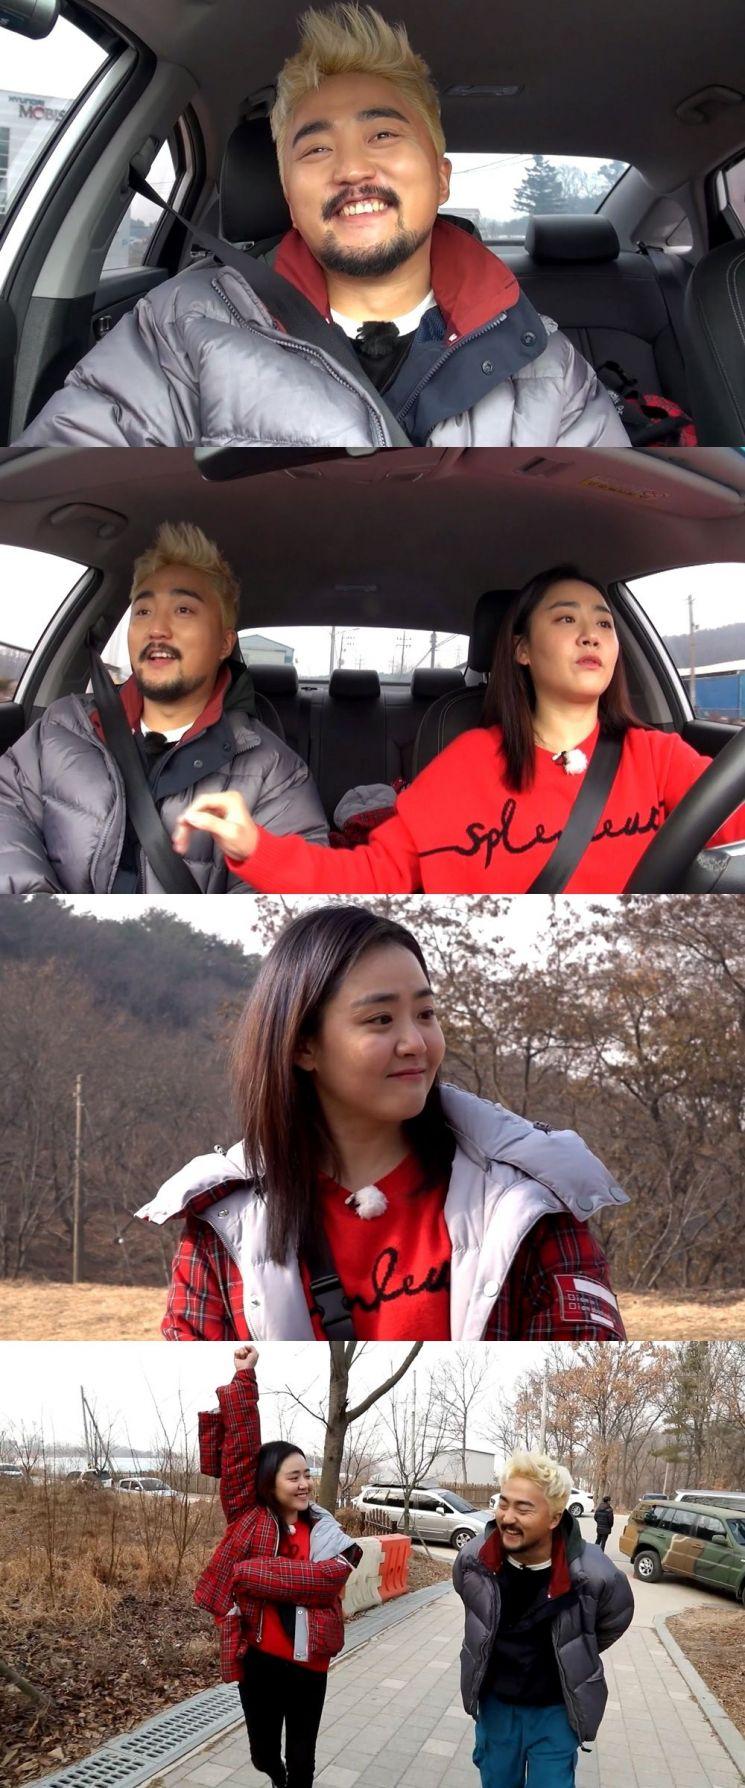 MBC '선을 넘는 녀석들' 배우 문근영과 코미디언 유병재 / 사진=MBC